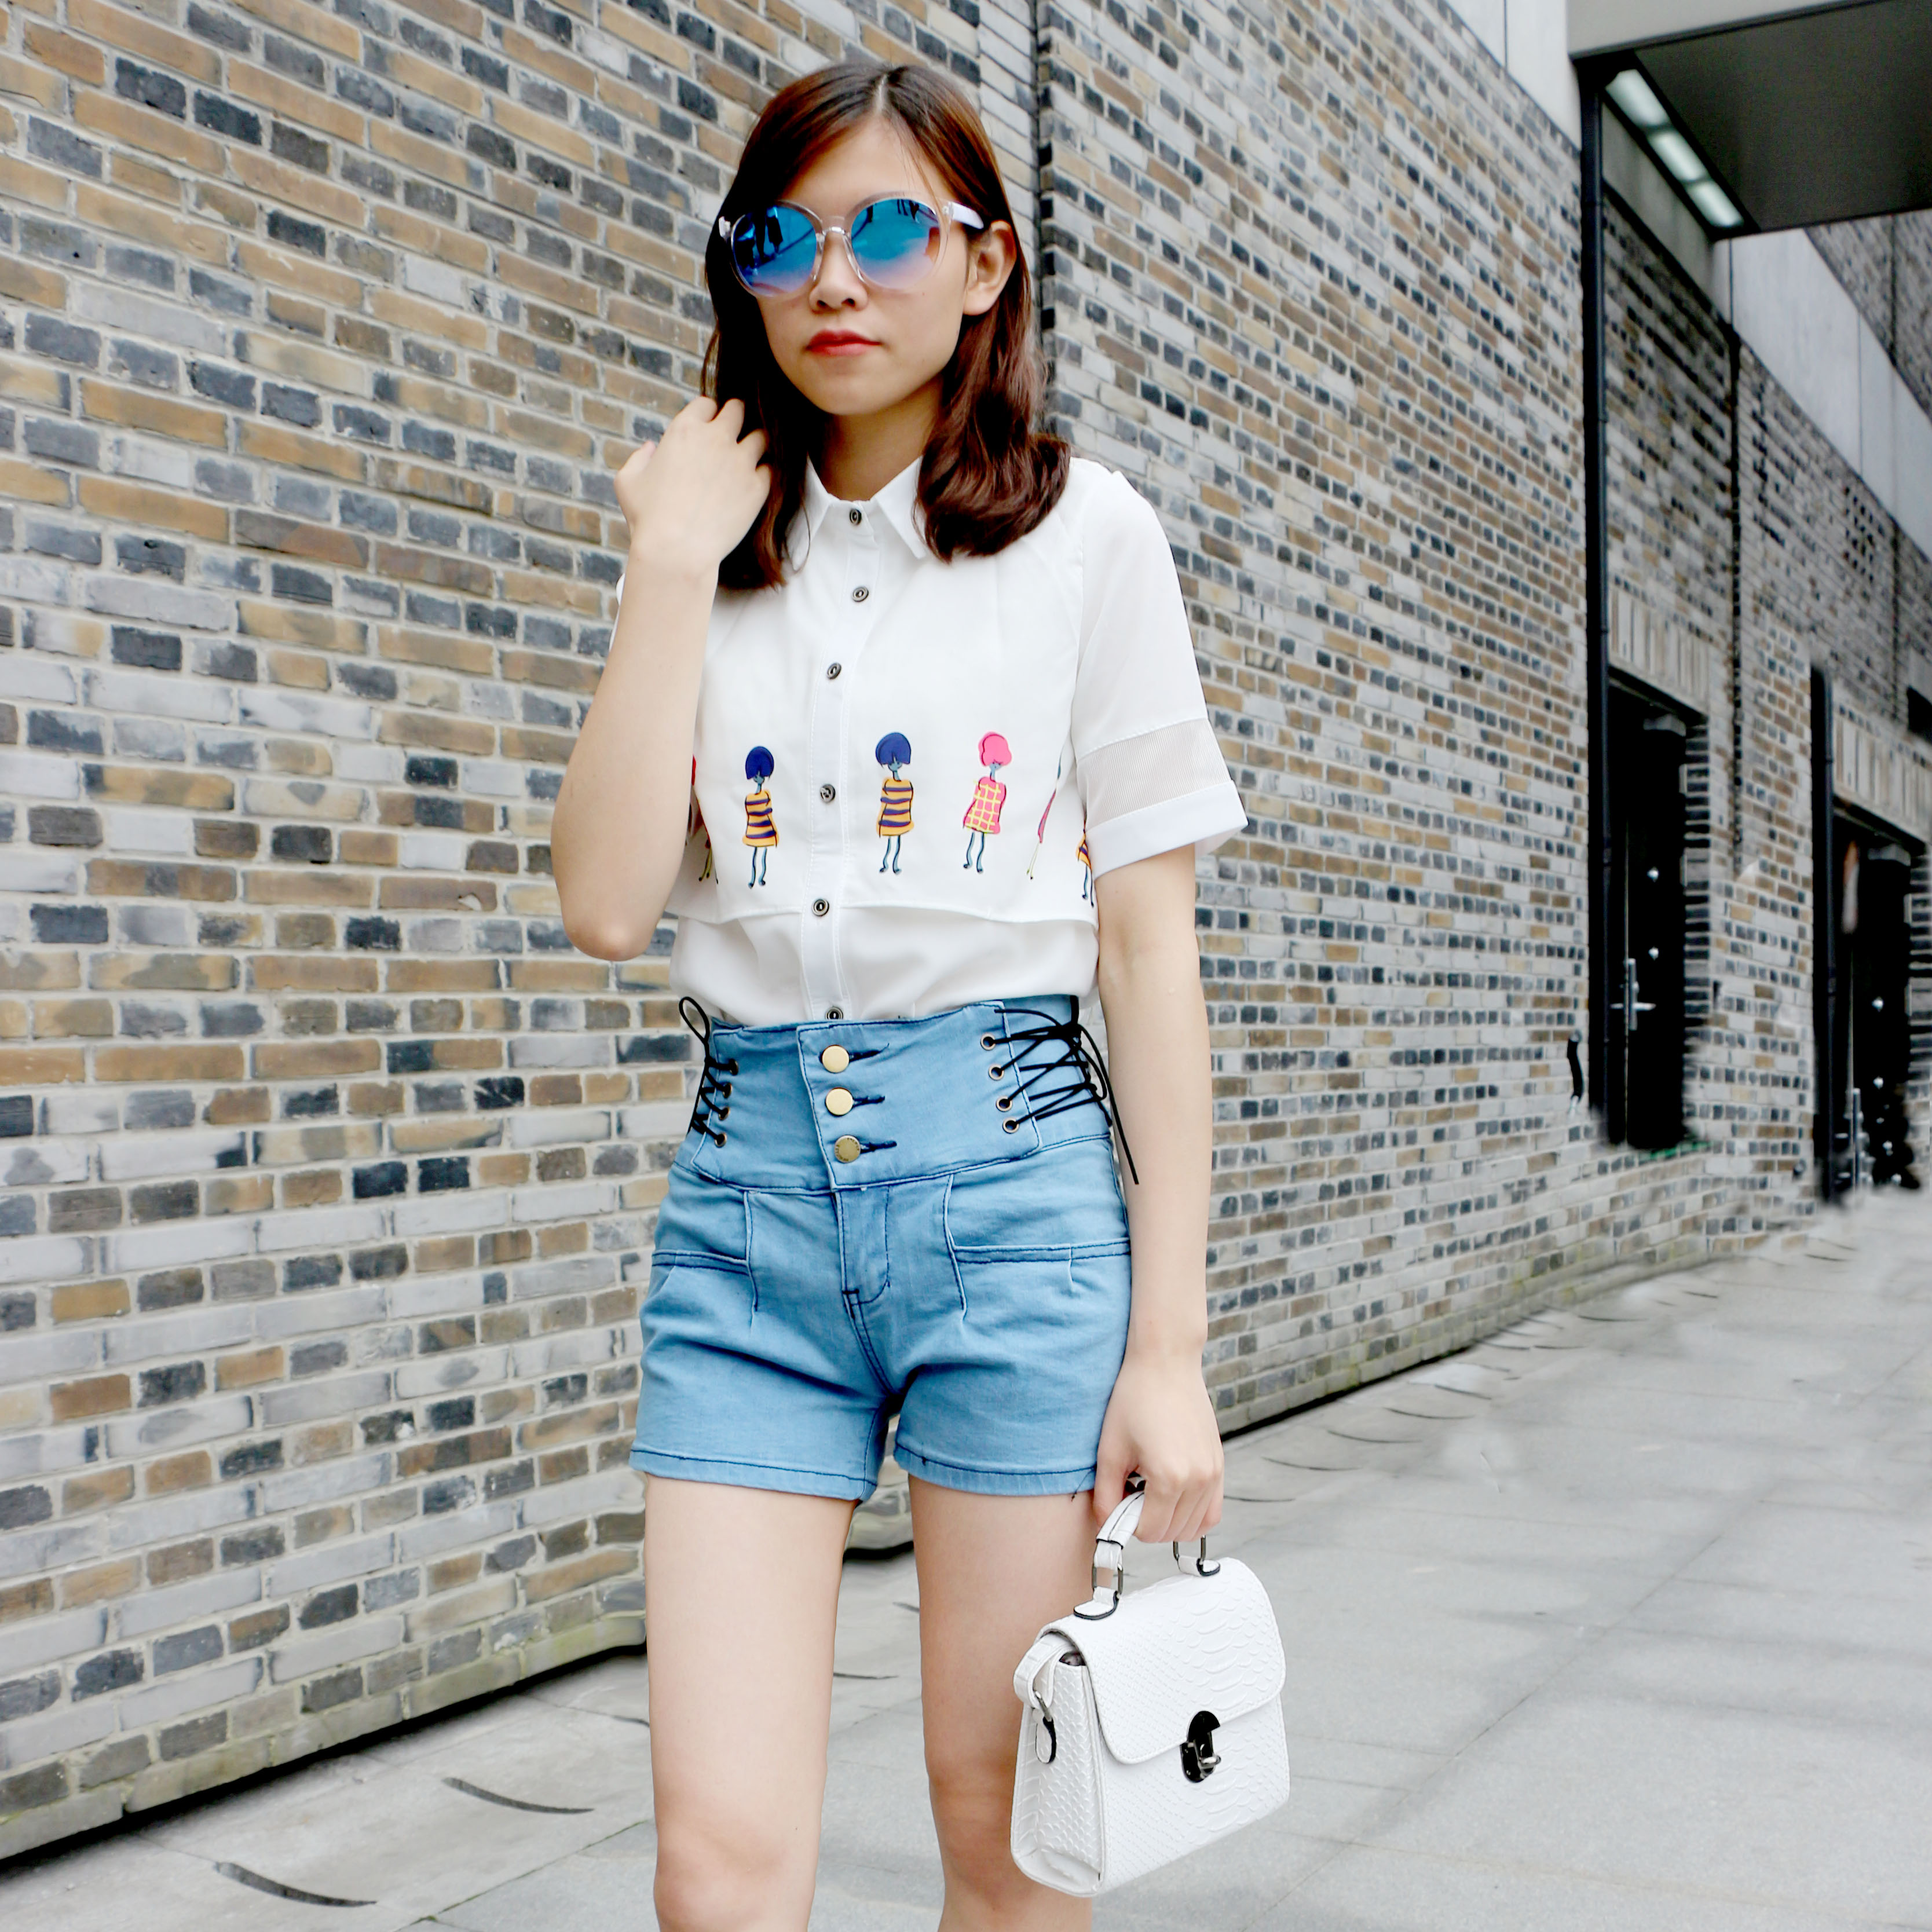 Fake two-piece Lapel fresh Lilliputian print short sleeve white shirt womens high waistband slim denim shorts suit